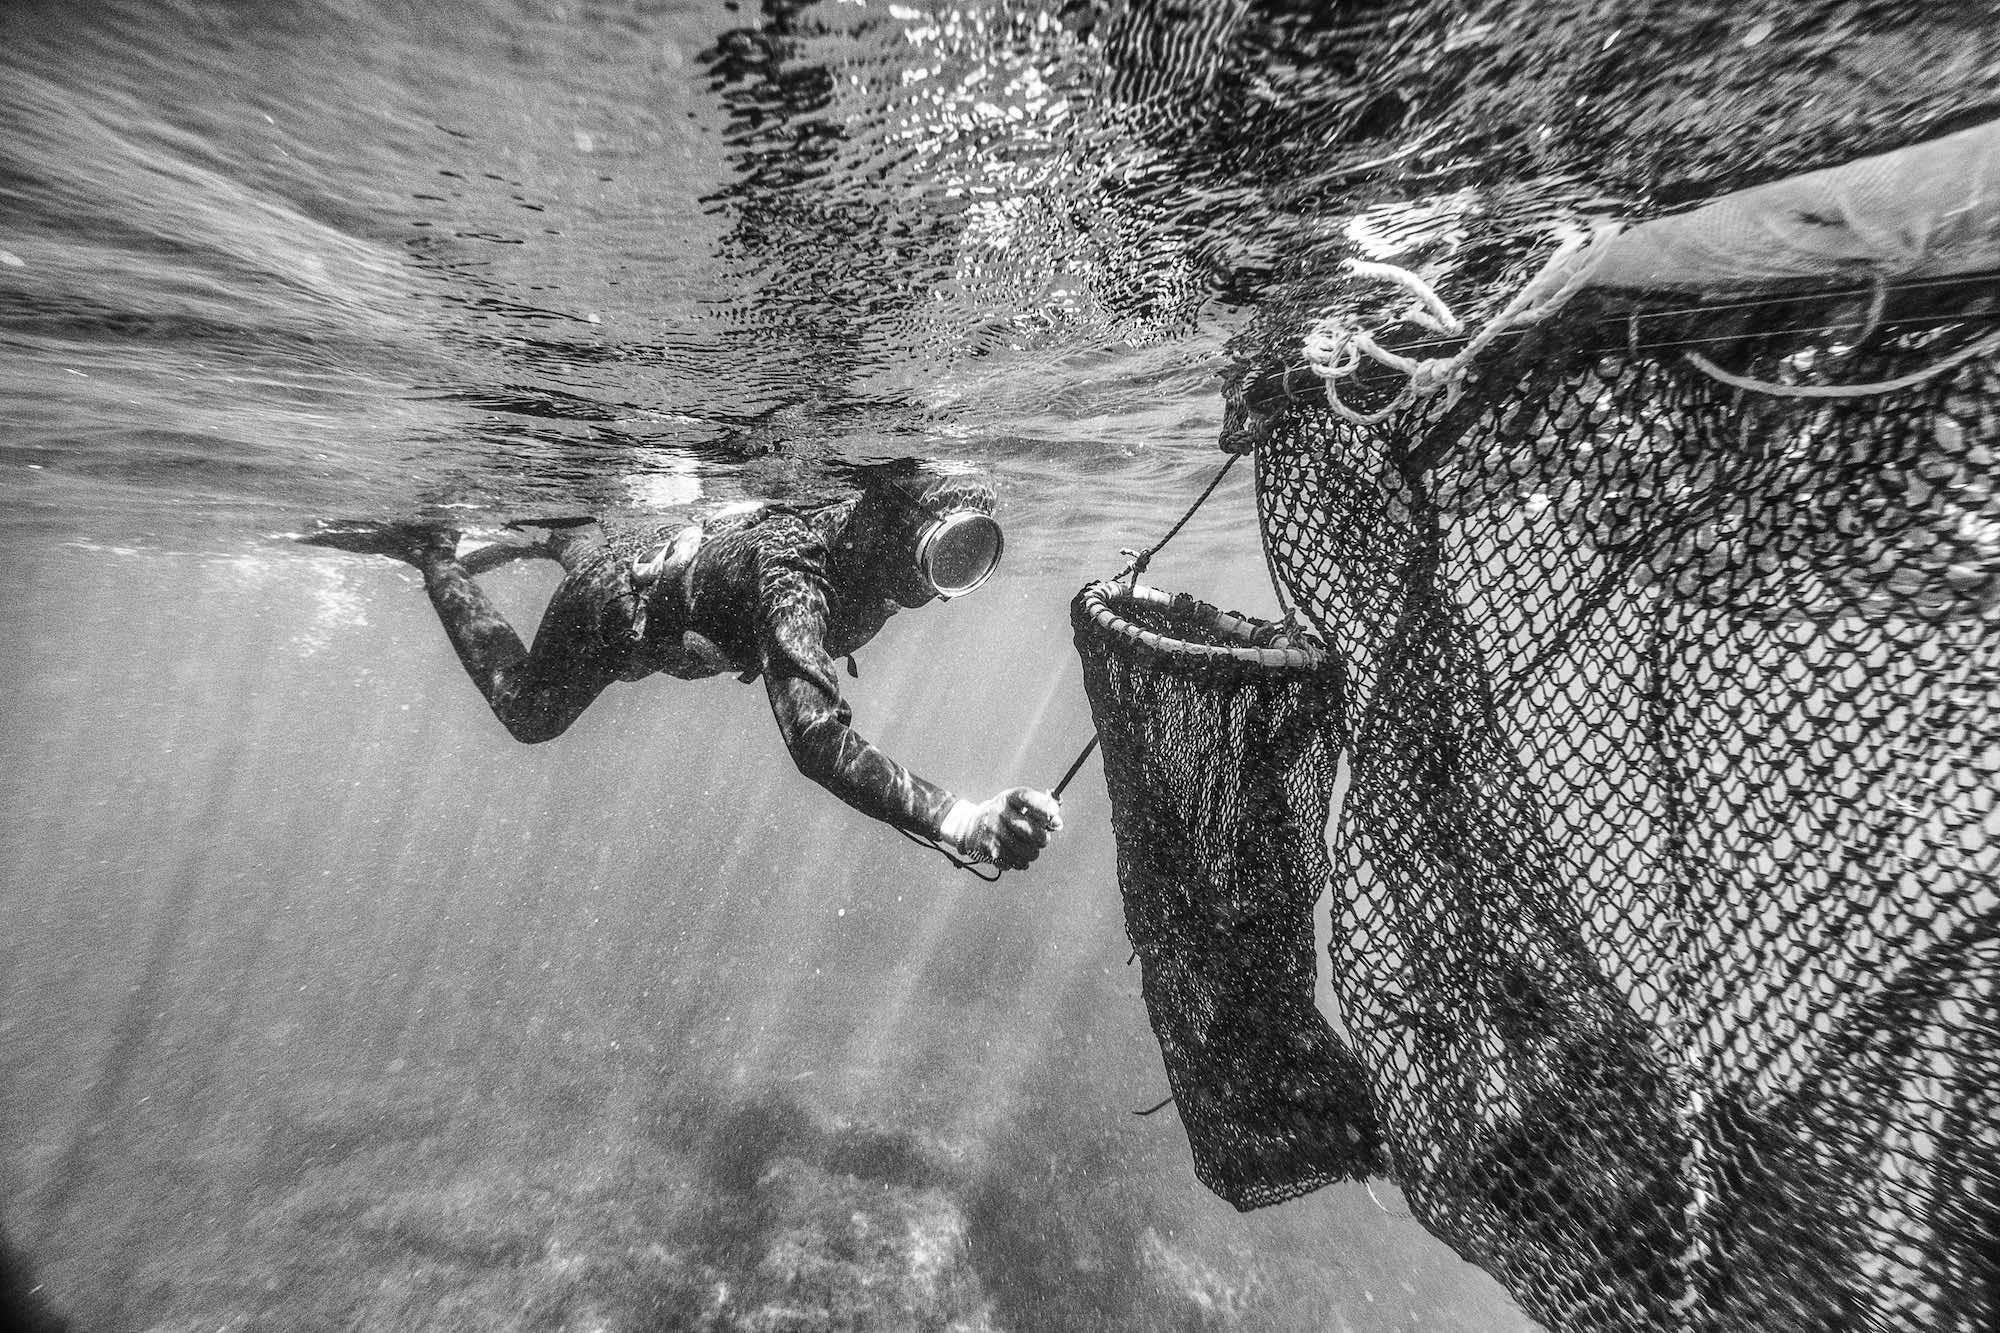 Underwater Photography Haenyeo Jeju FUJIFILM XT2 Singapore Jose Jeuland COCO Creative Studio 4